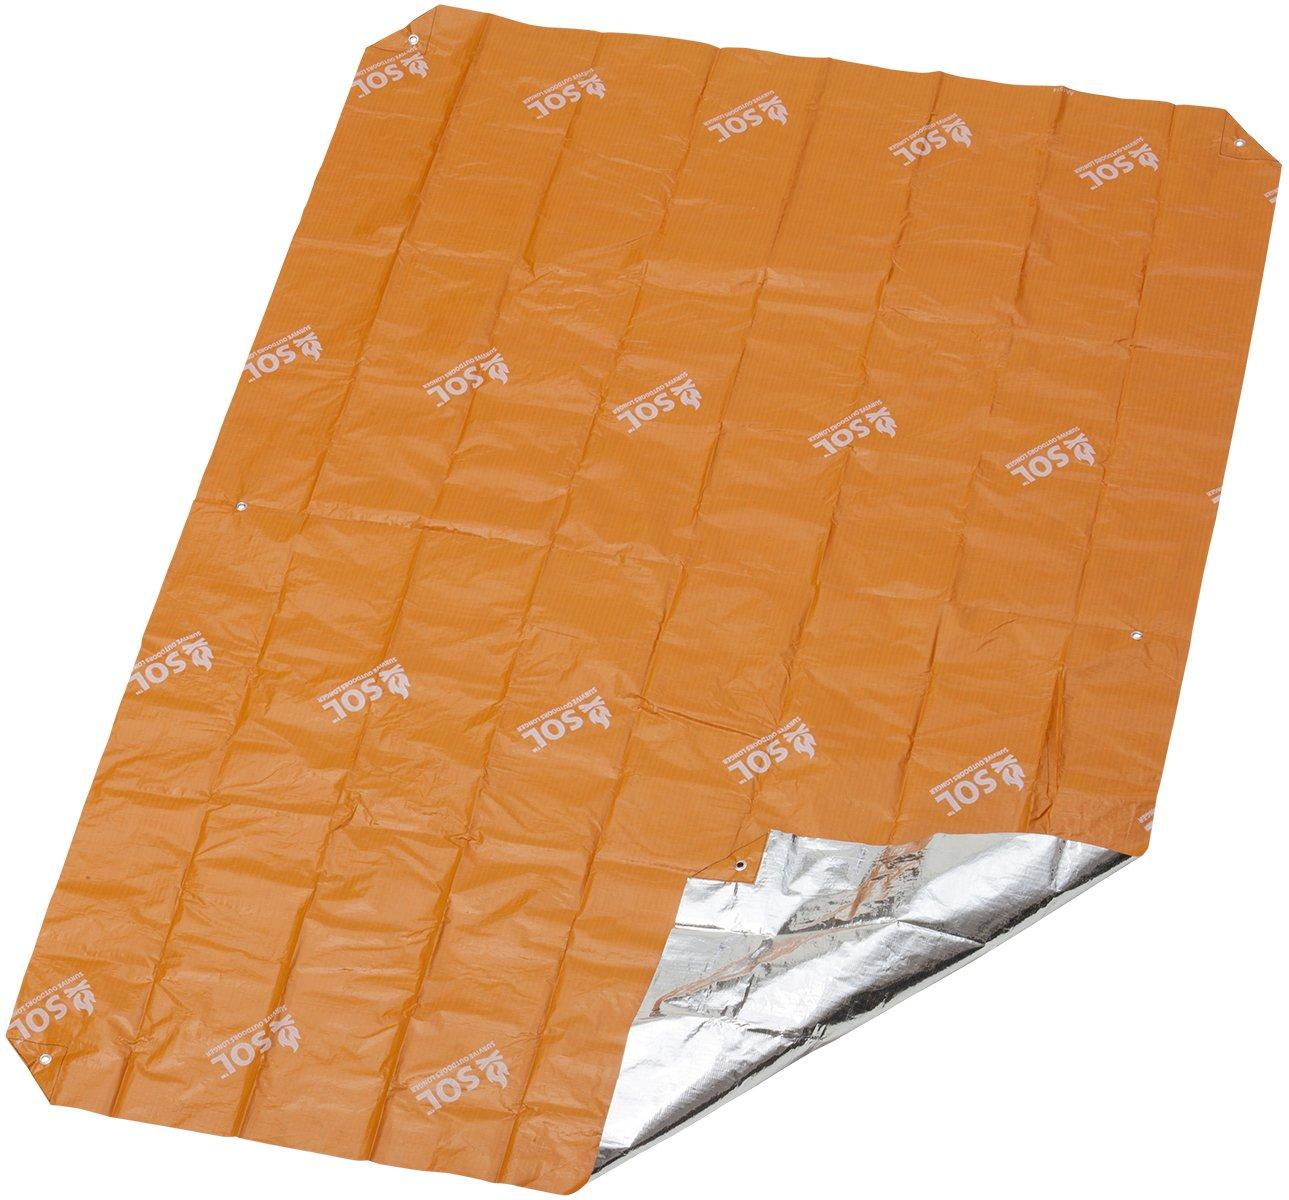 S.O.L. Survive Outdoors Longer 95 Percent Heat Reflective Sport Utility Blanket